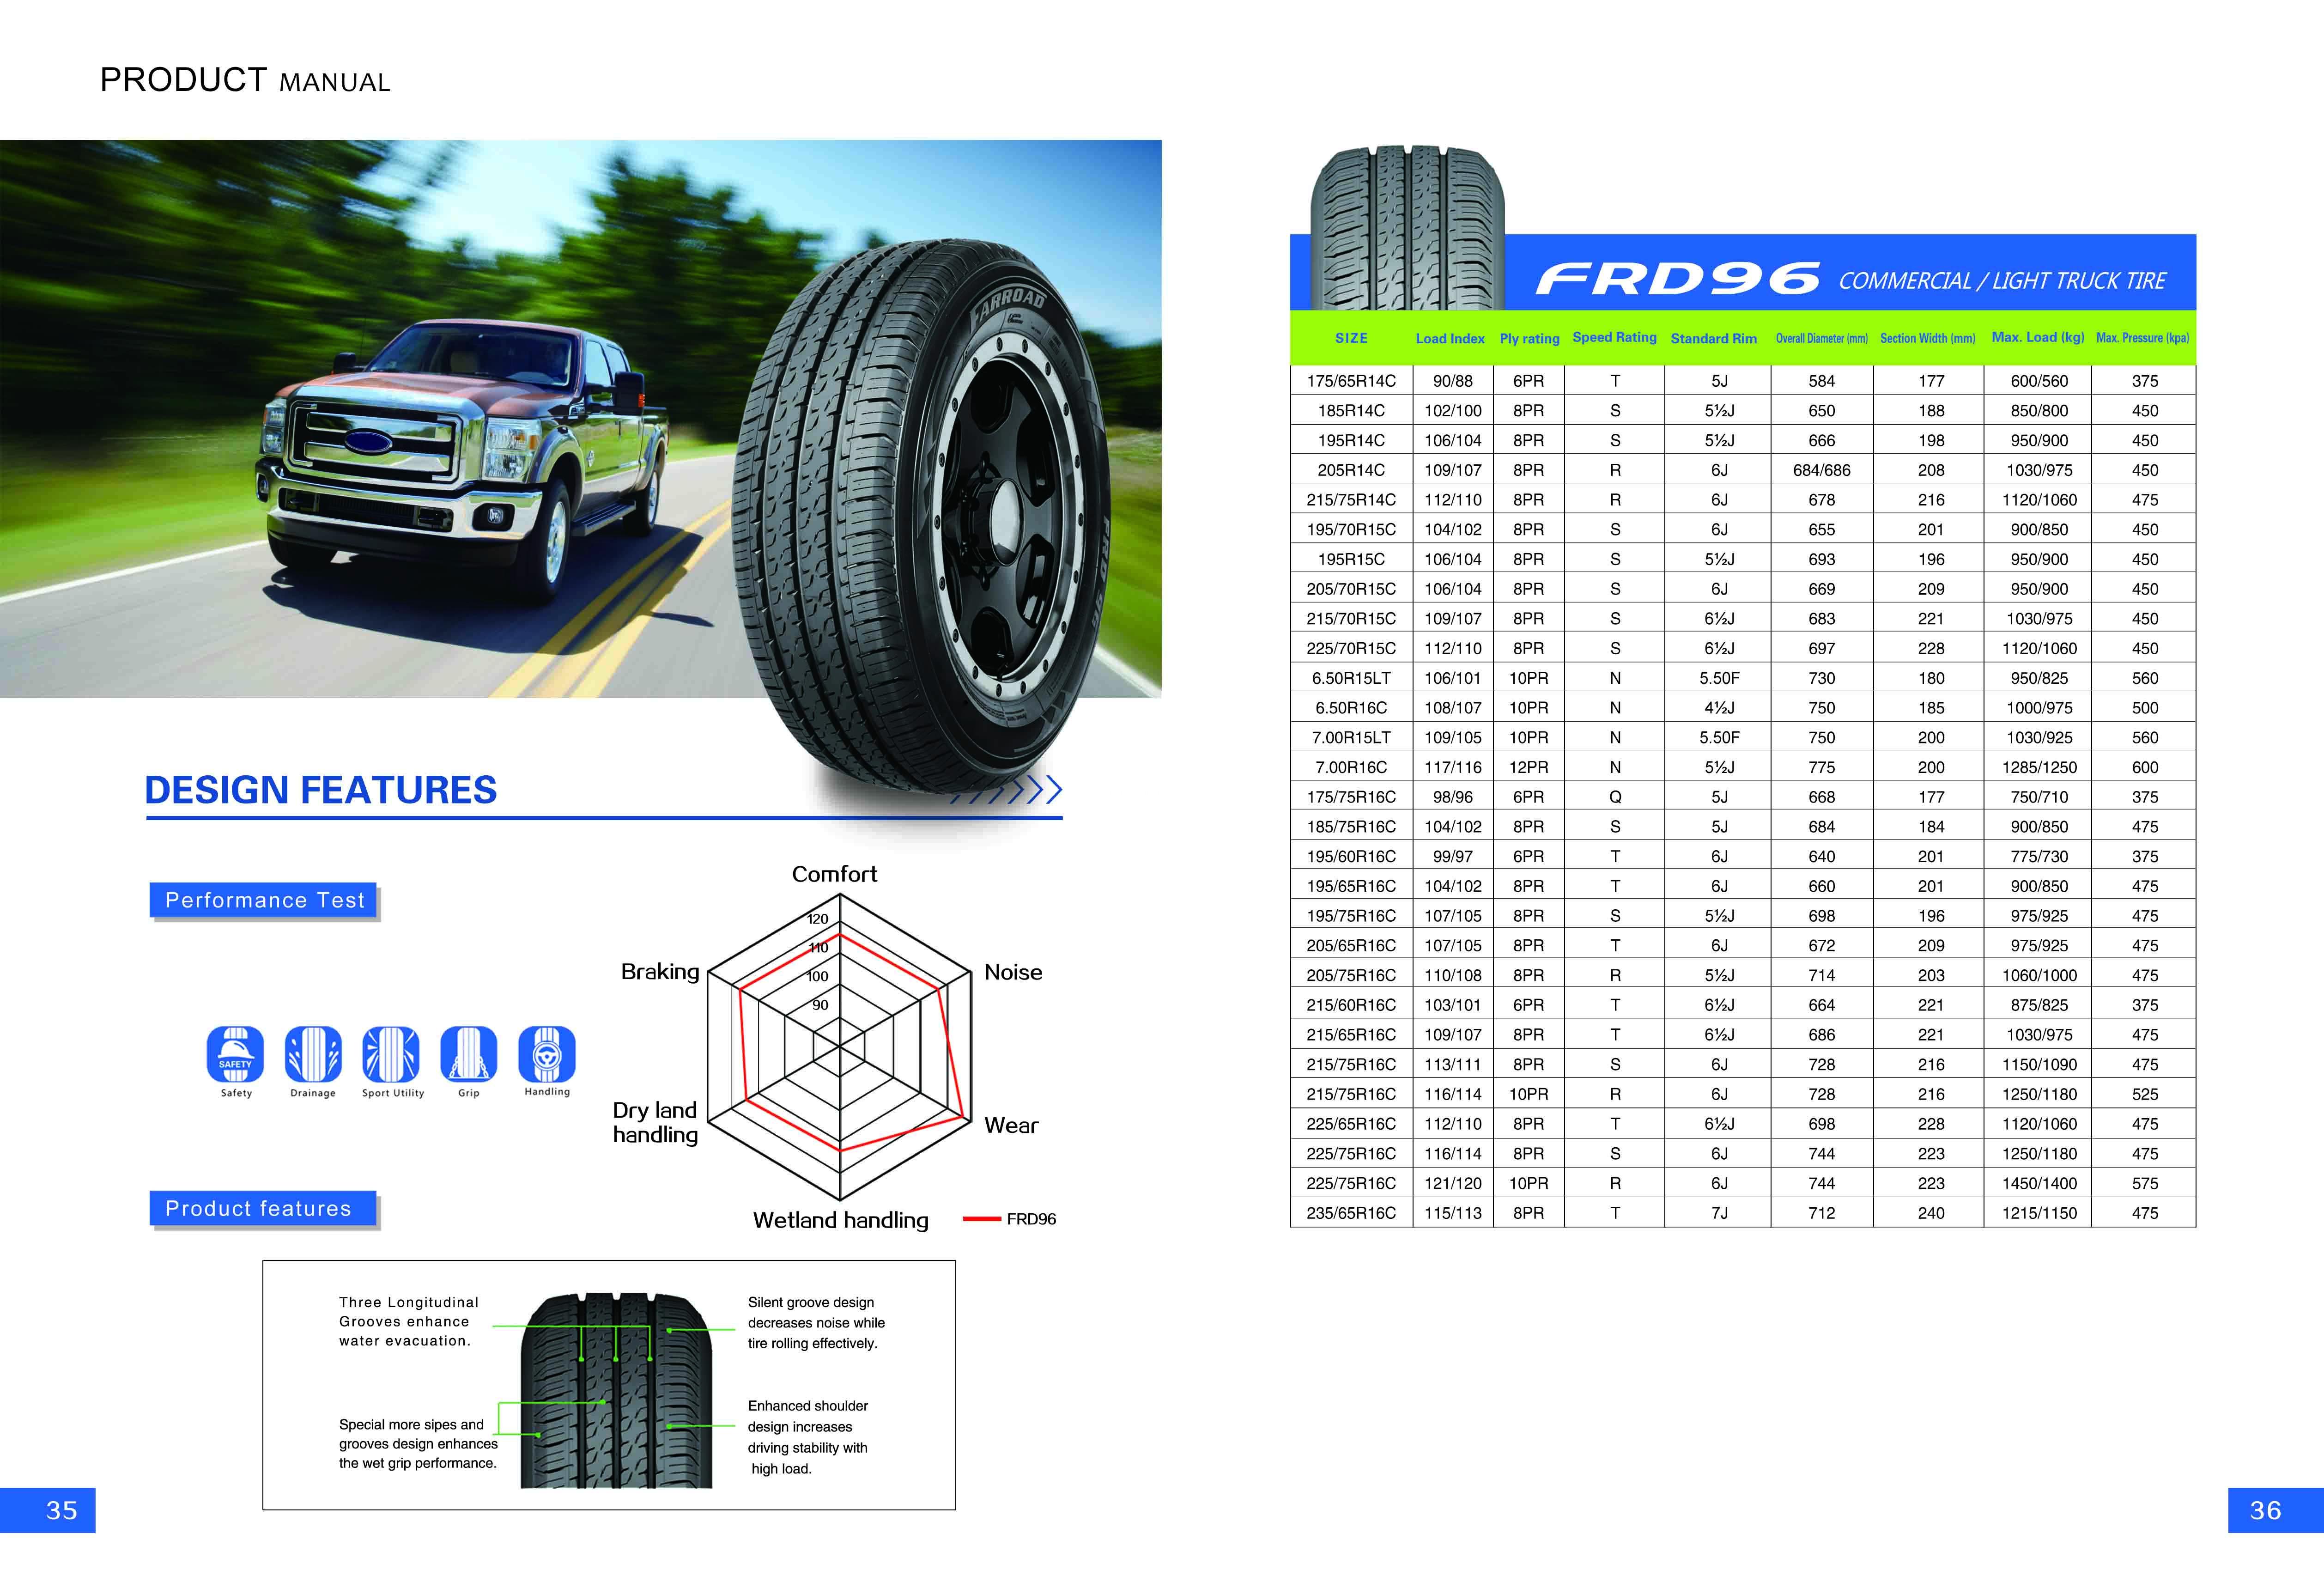 18-FRD96 LT TIRE 205/70R15C